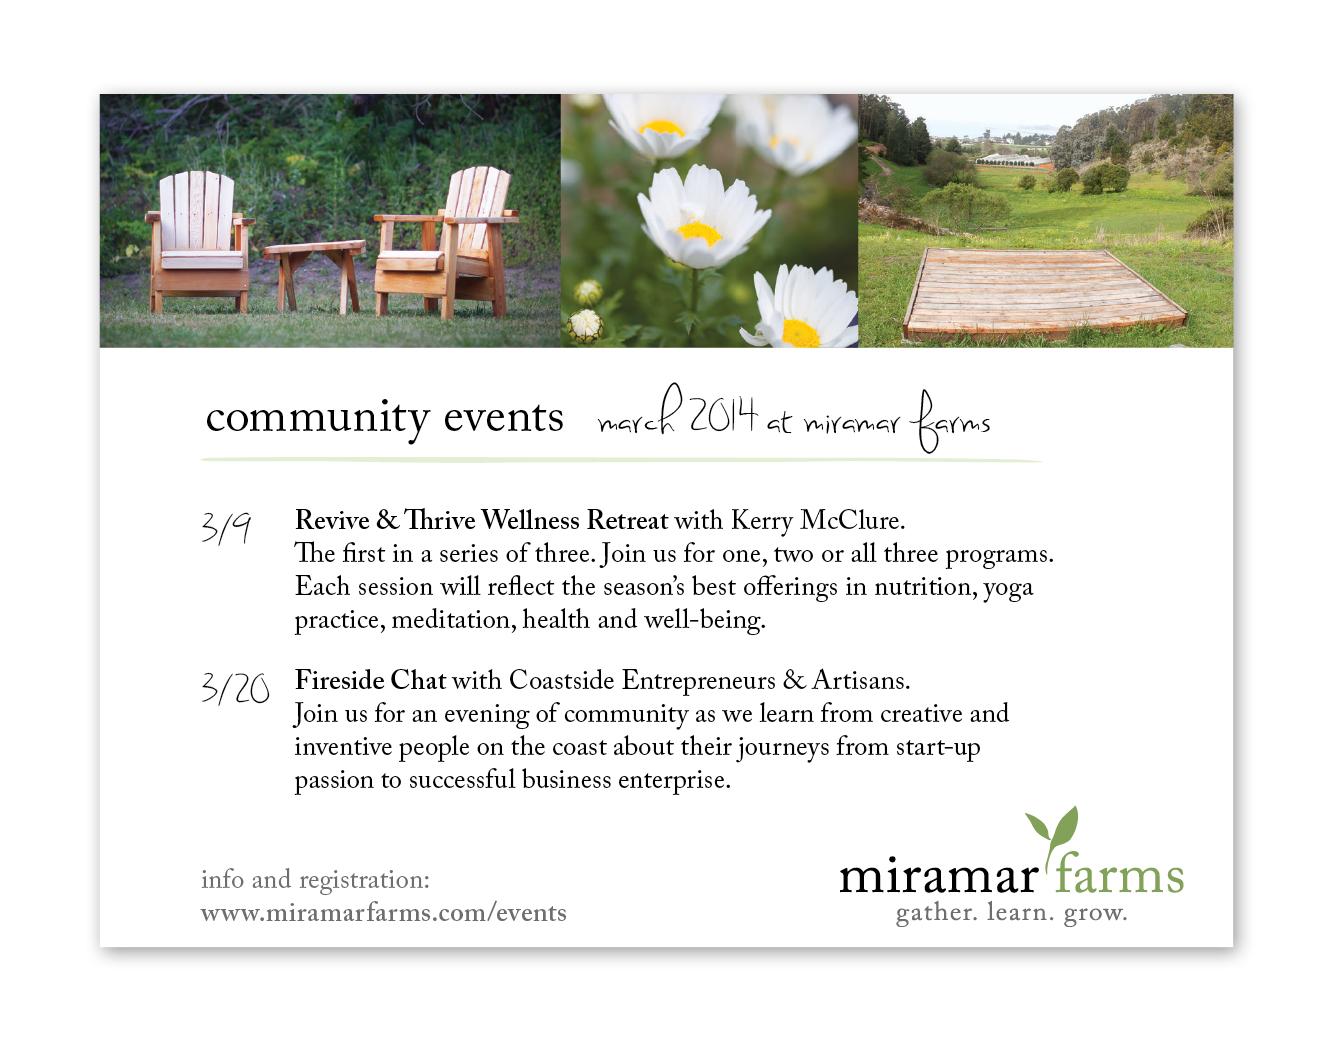 Miramar Farms Event Postcard - Front